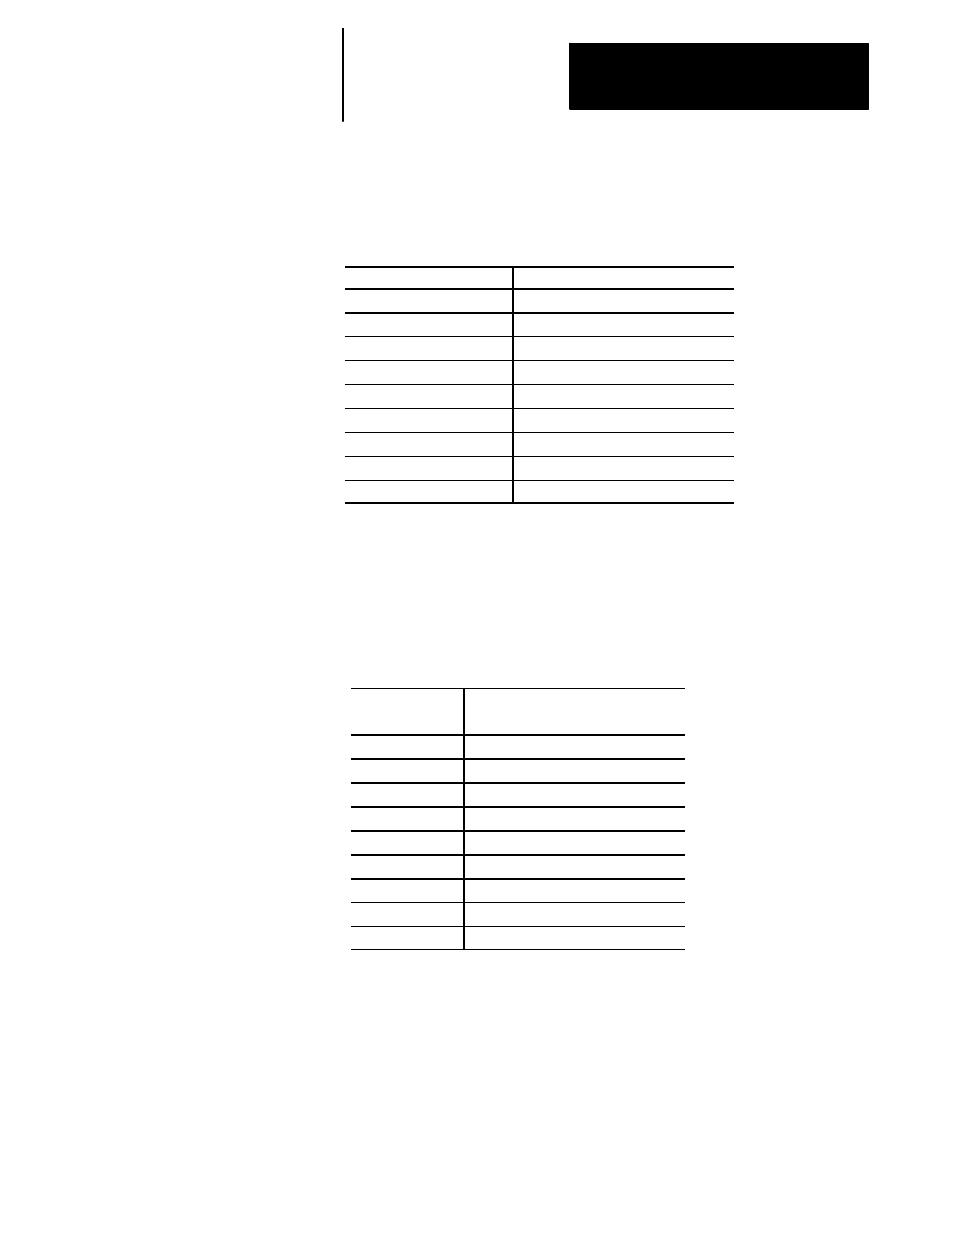 facit n4000 tape reader punch connection decitek ab 8000 xpdr rh manualsdir com Facit Latin Facit Latin